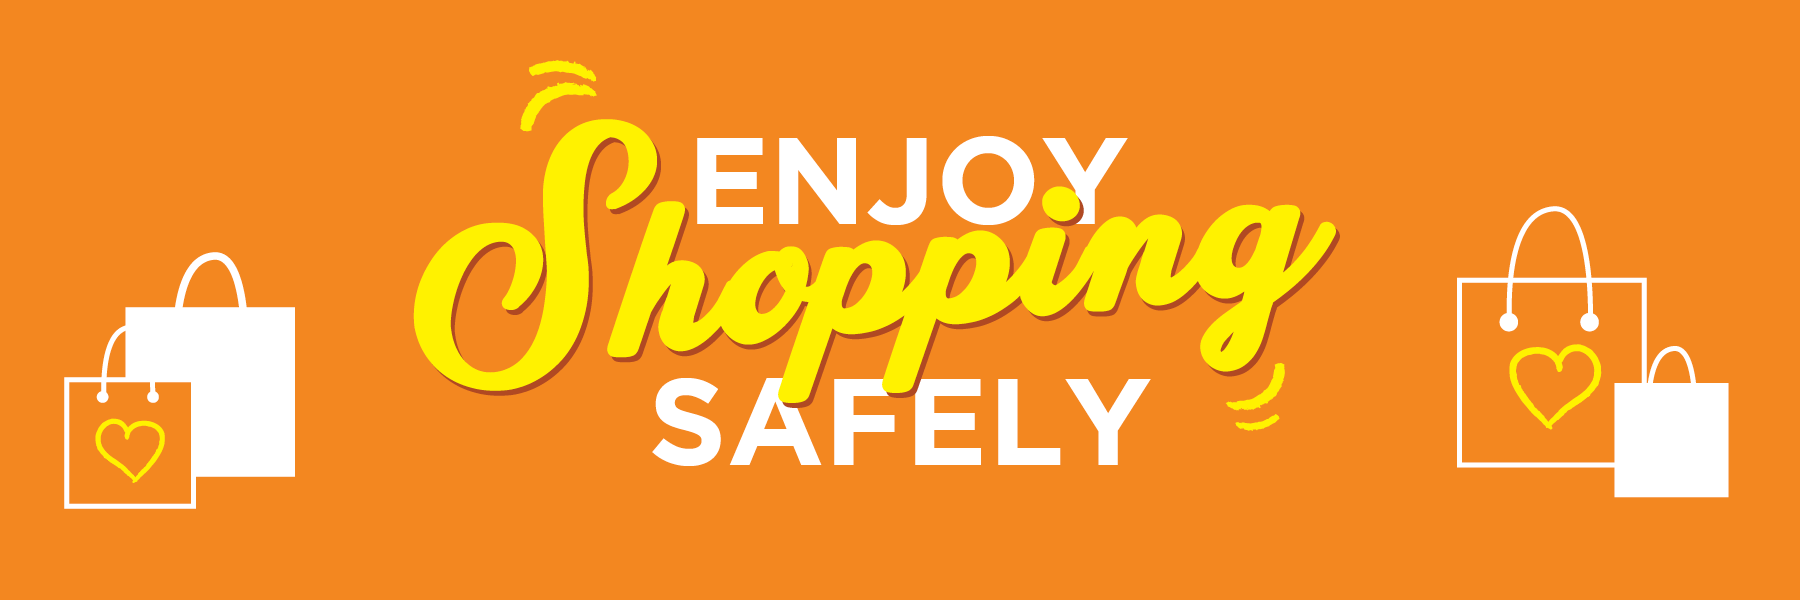 Enjoy Shopping Safely